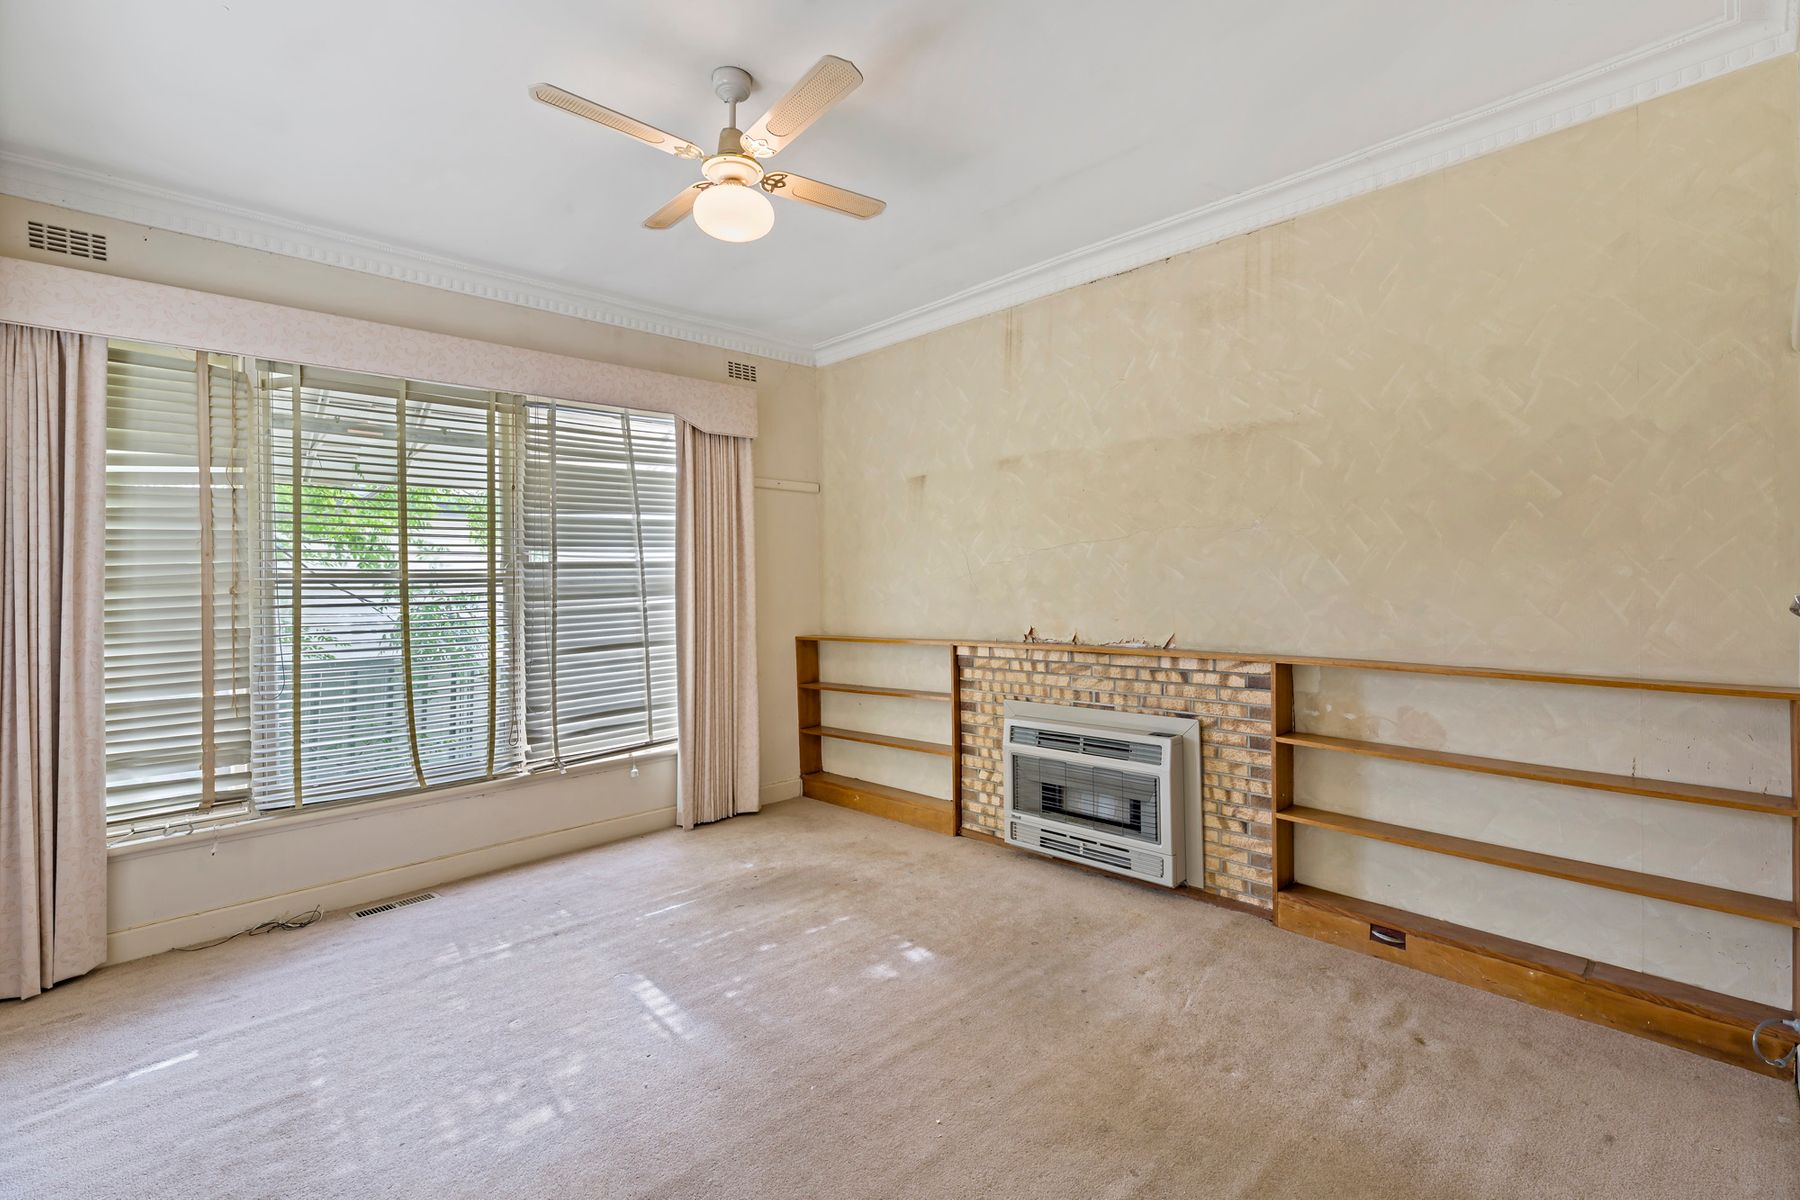 39 Ellis Street, Flora Hill, VIC 3550